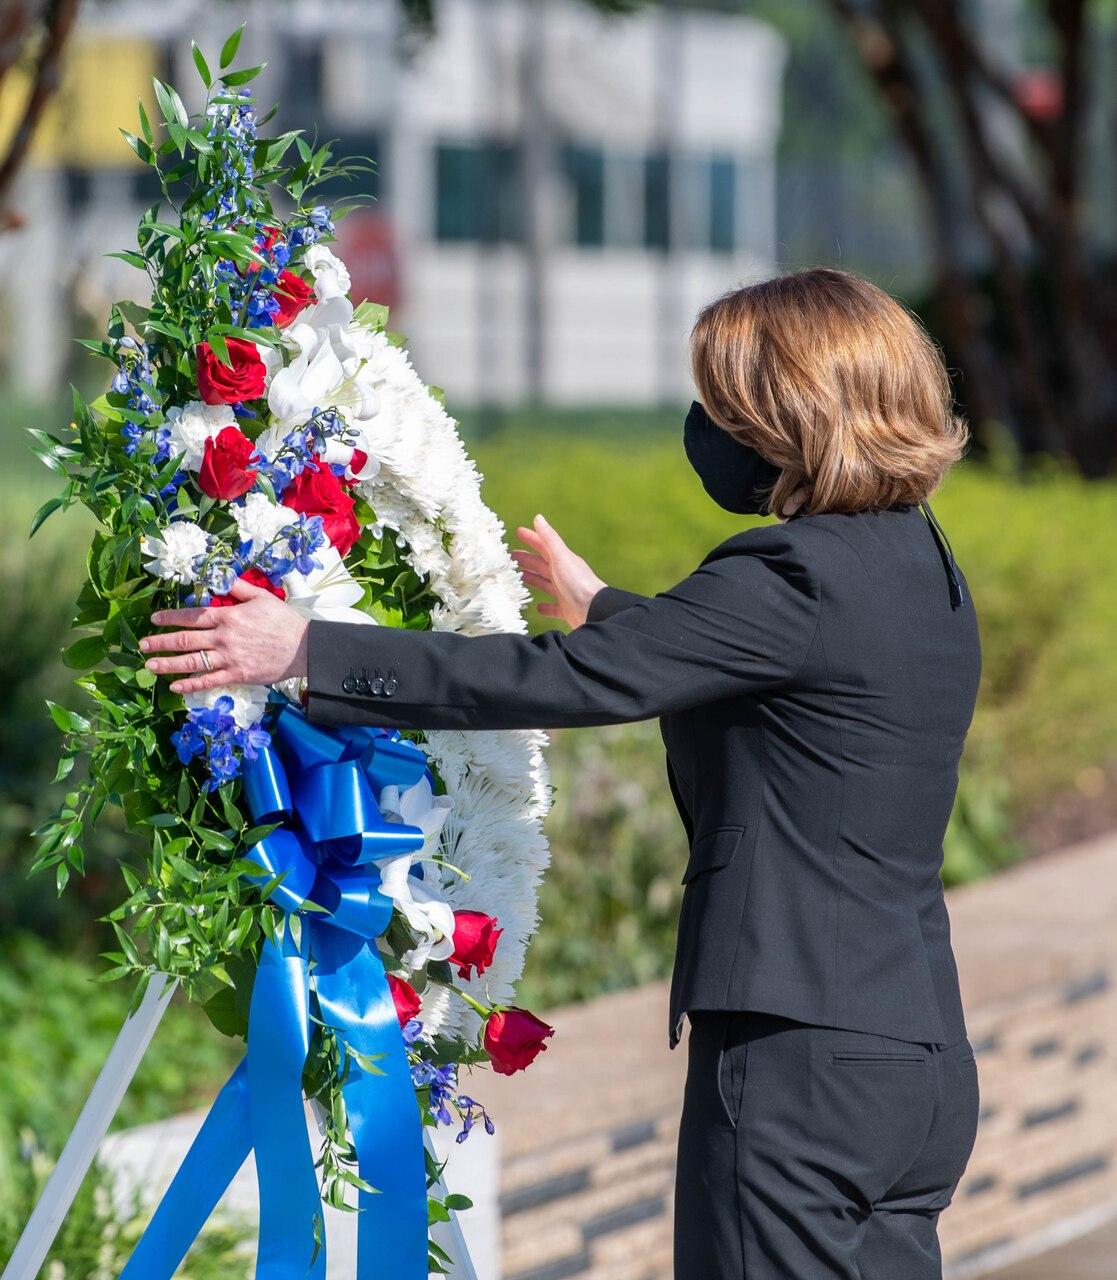 A woman lays a wreath at a memorial.